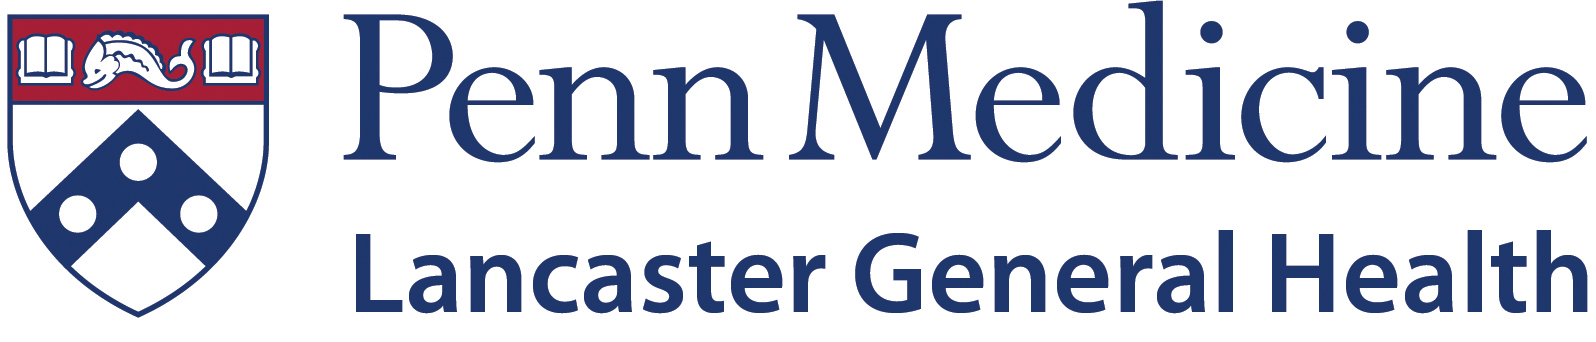 Penn Medicine Lancaster General Health